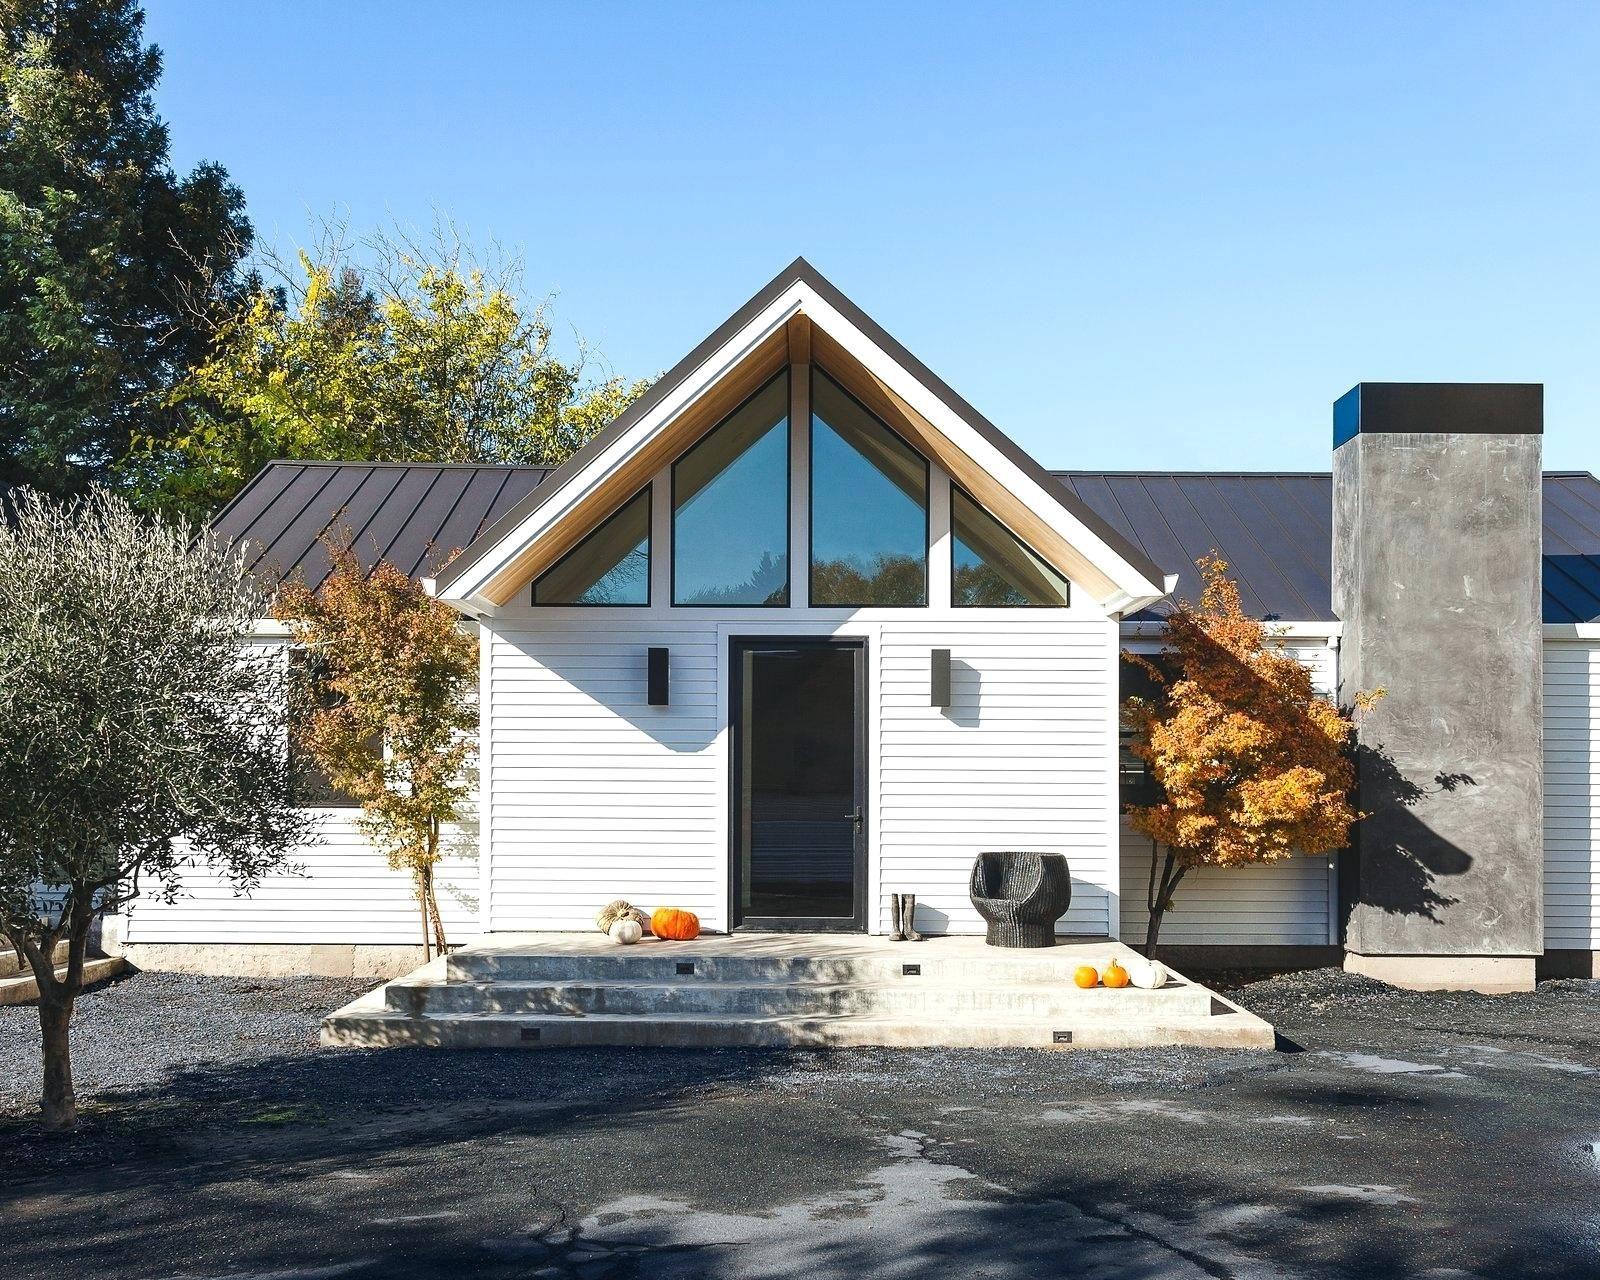 Concrete Siding Hardiplank Cost Vs Brick Board House Fiber Cement Shingles Farmhouse Exterior Modern Farmhouse Exterior